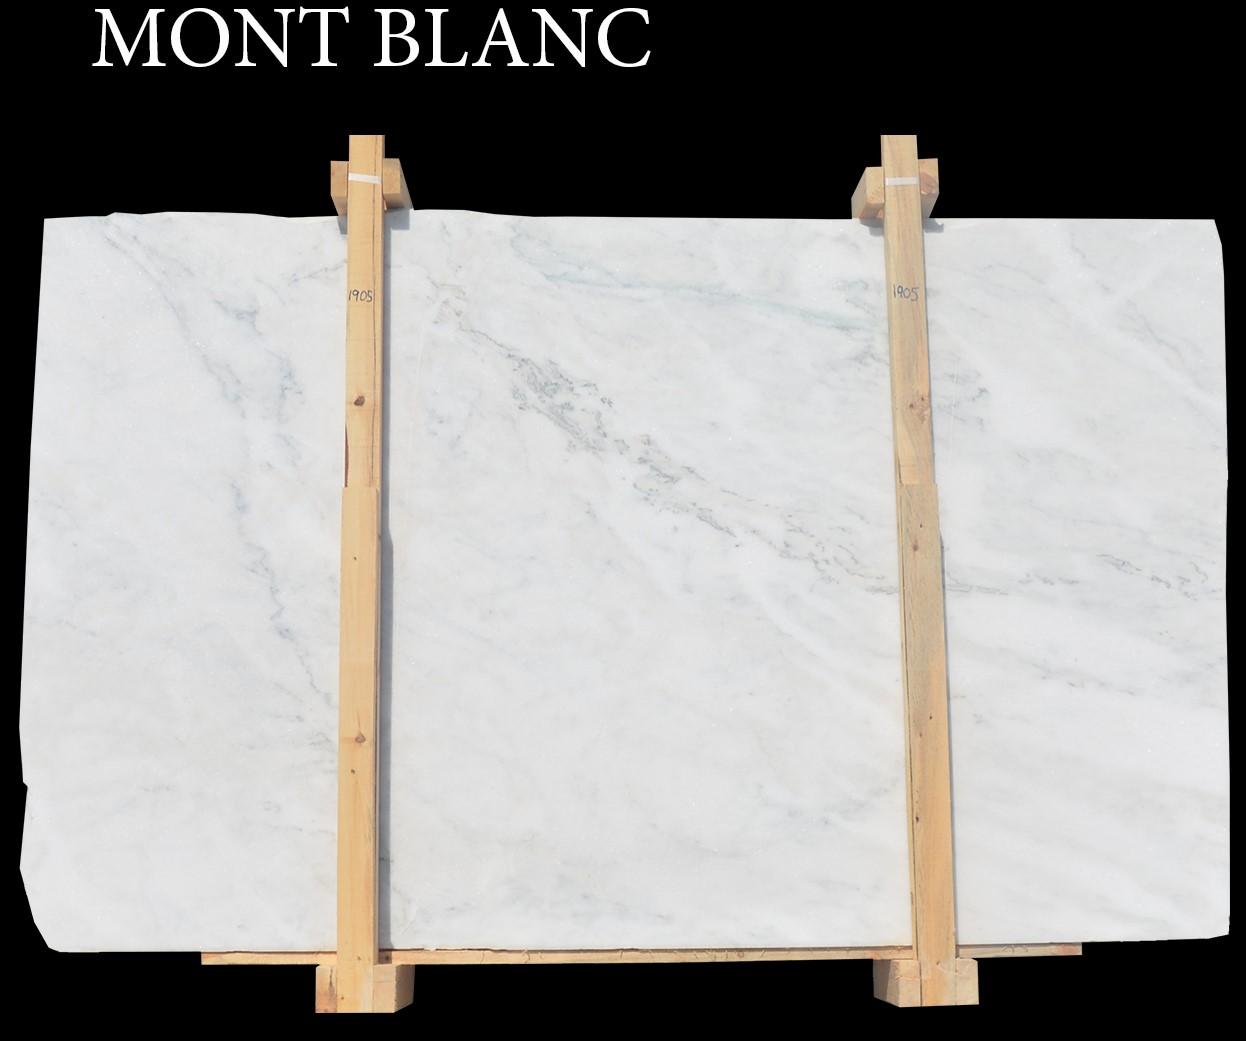 Mugla White Marble Slabs  Mont Blanc Slabs